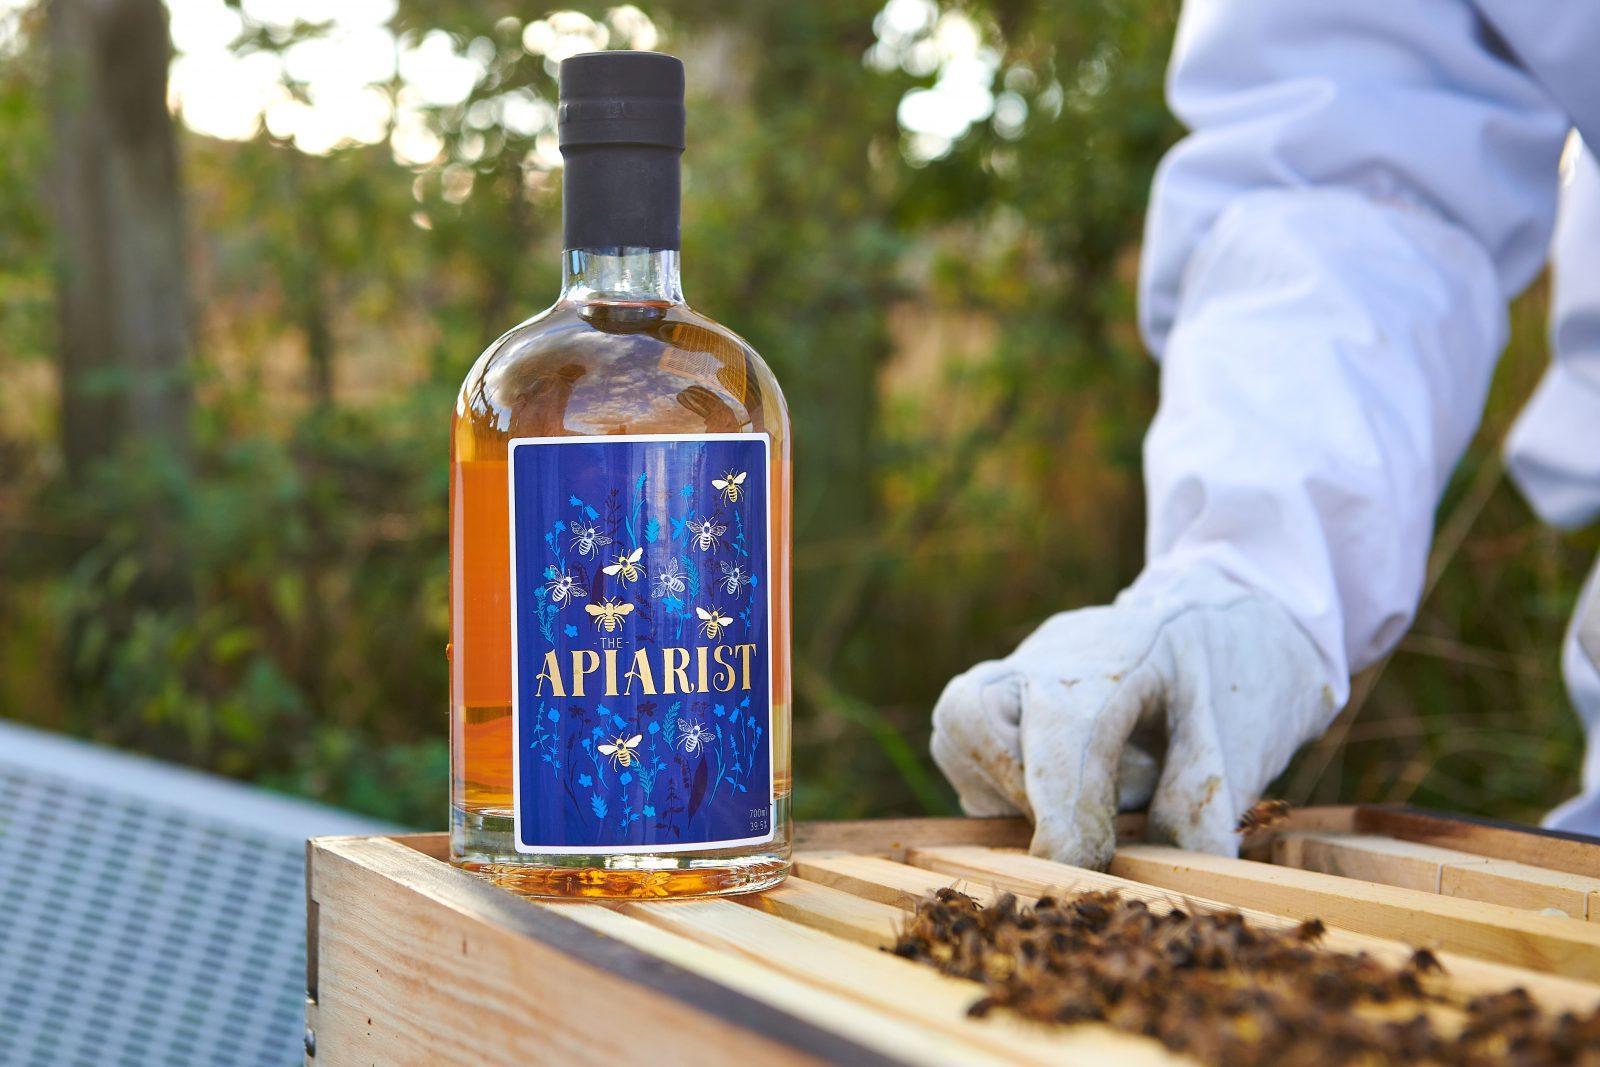 The Apiarist gin bottle